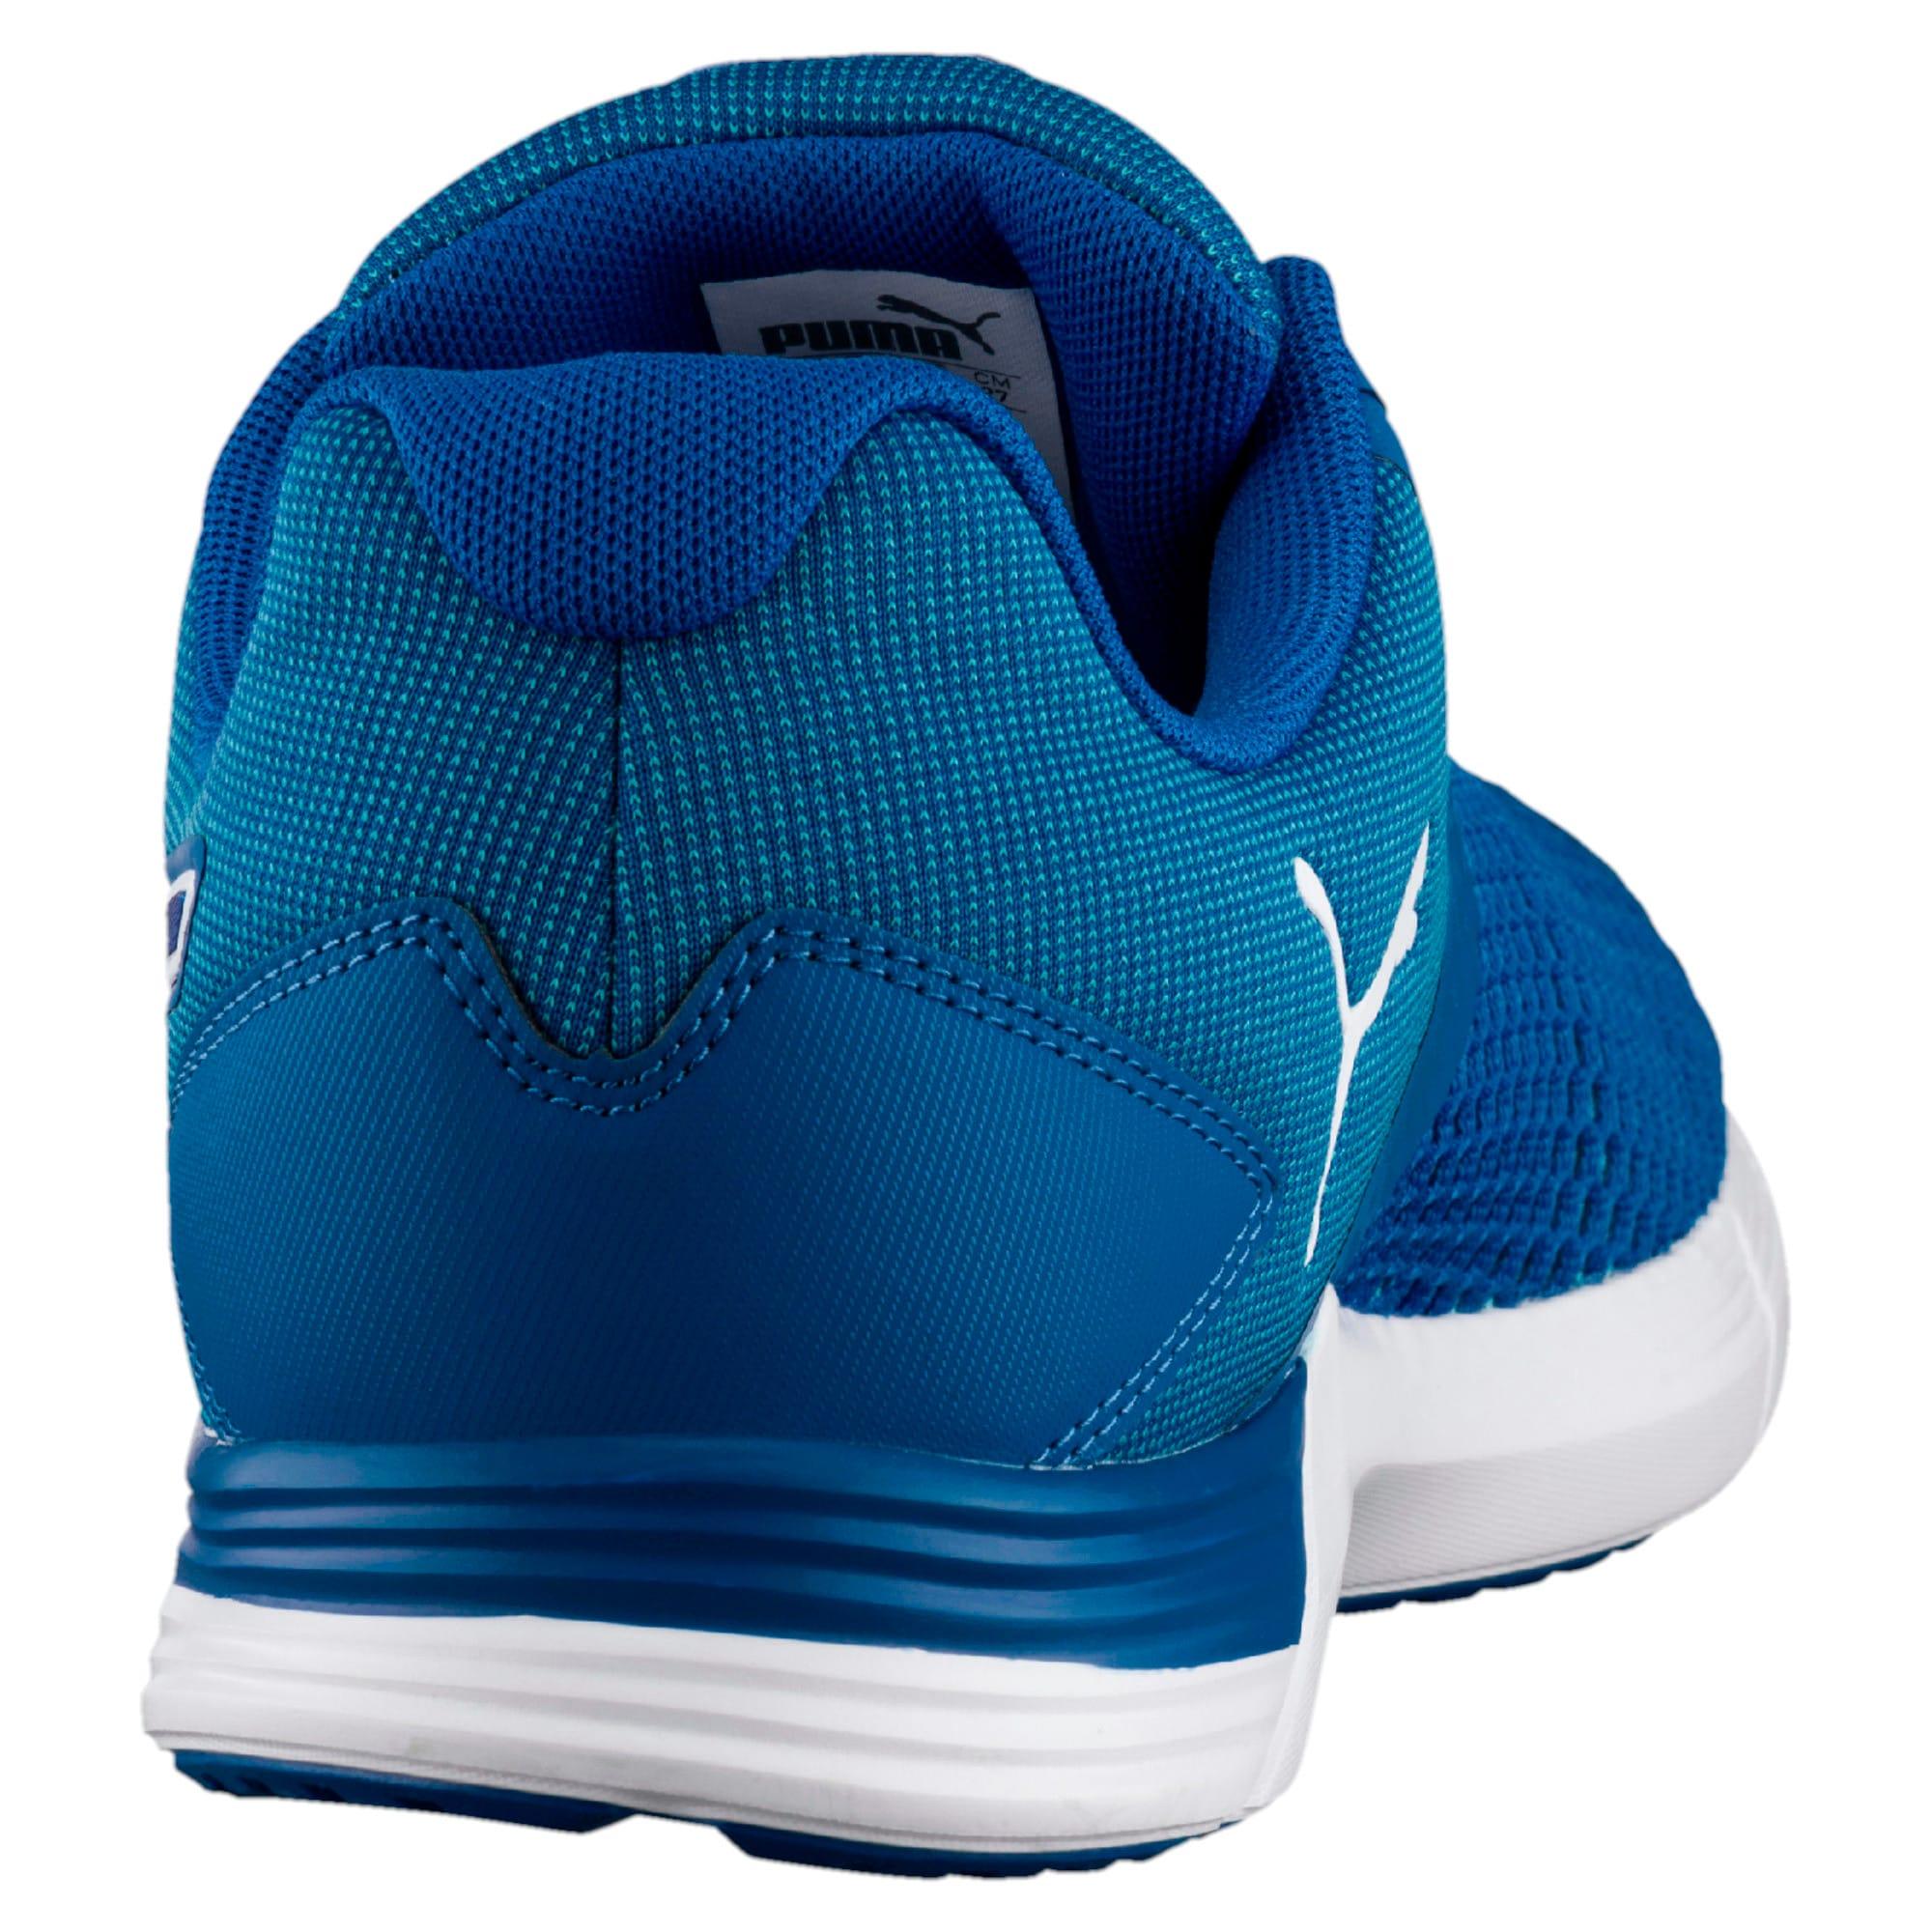 Thumbnail 3 of Propel 2 Men's Running Shoes, Lapis Blue-Turquoise-White, medium-IND